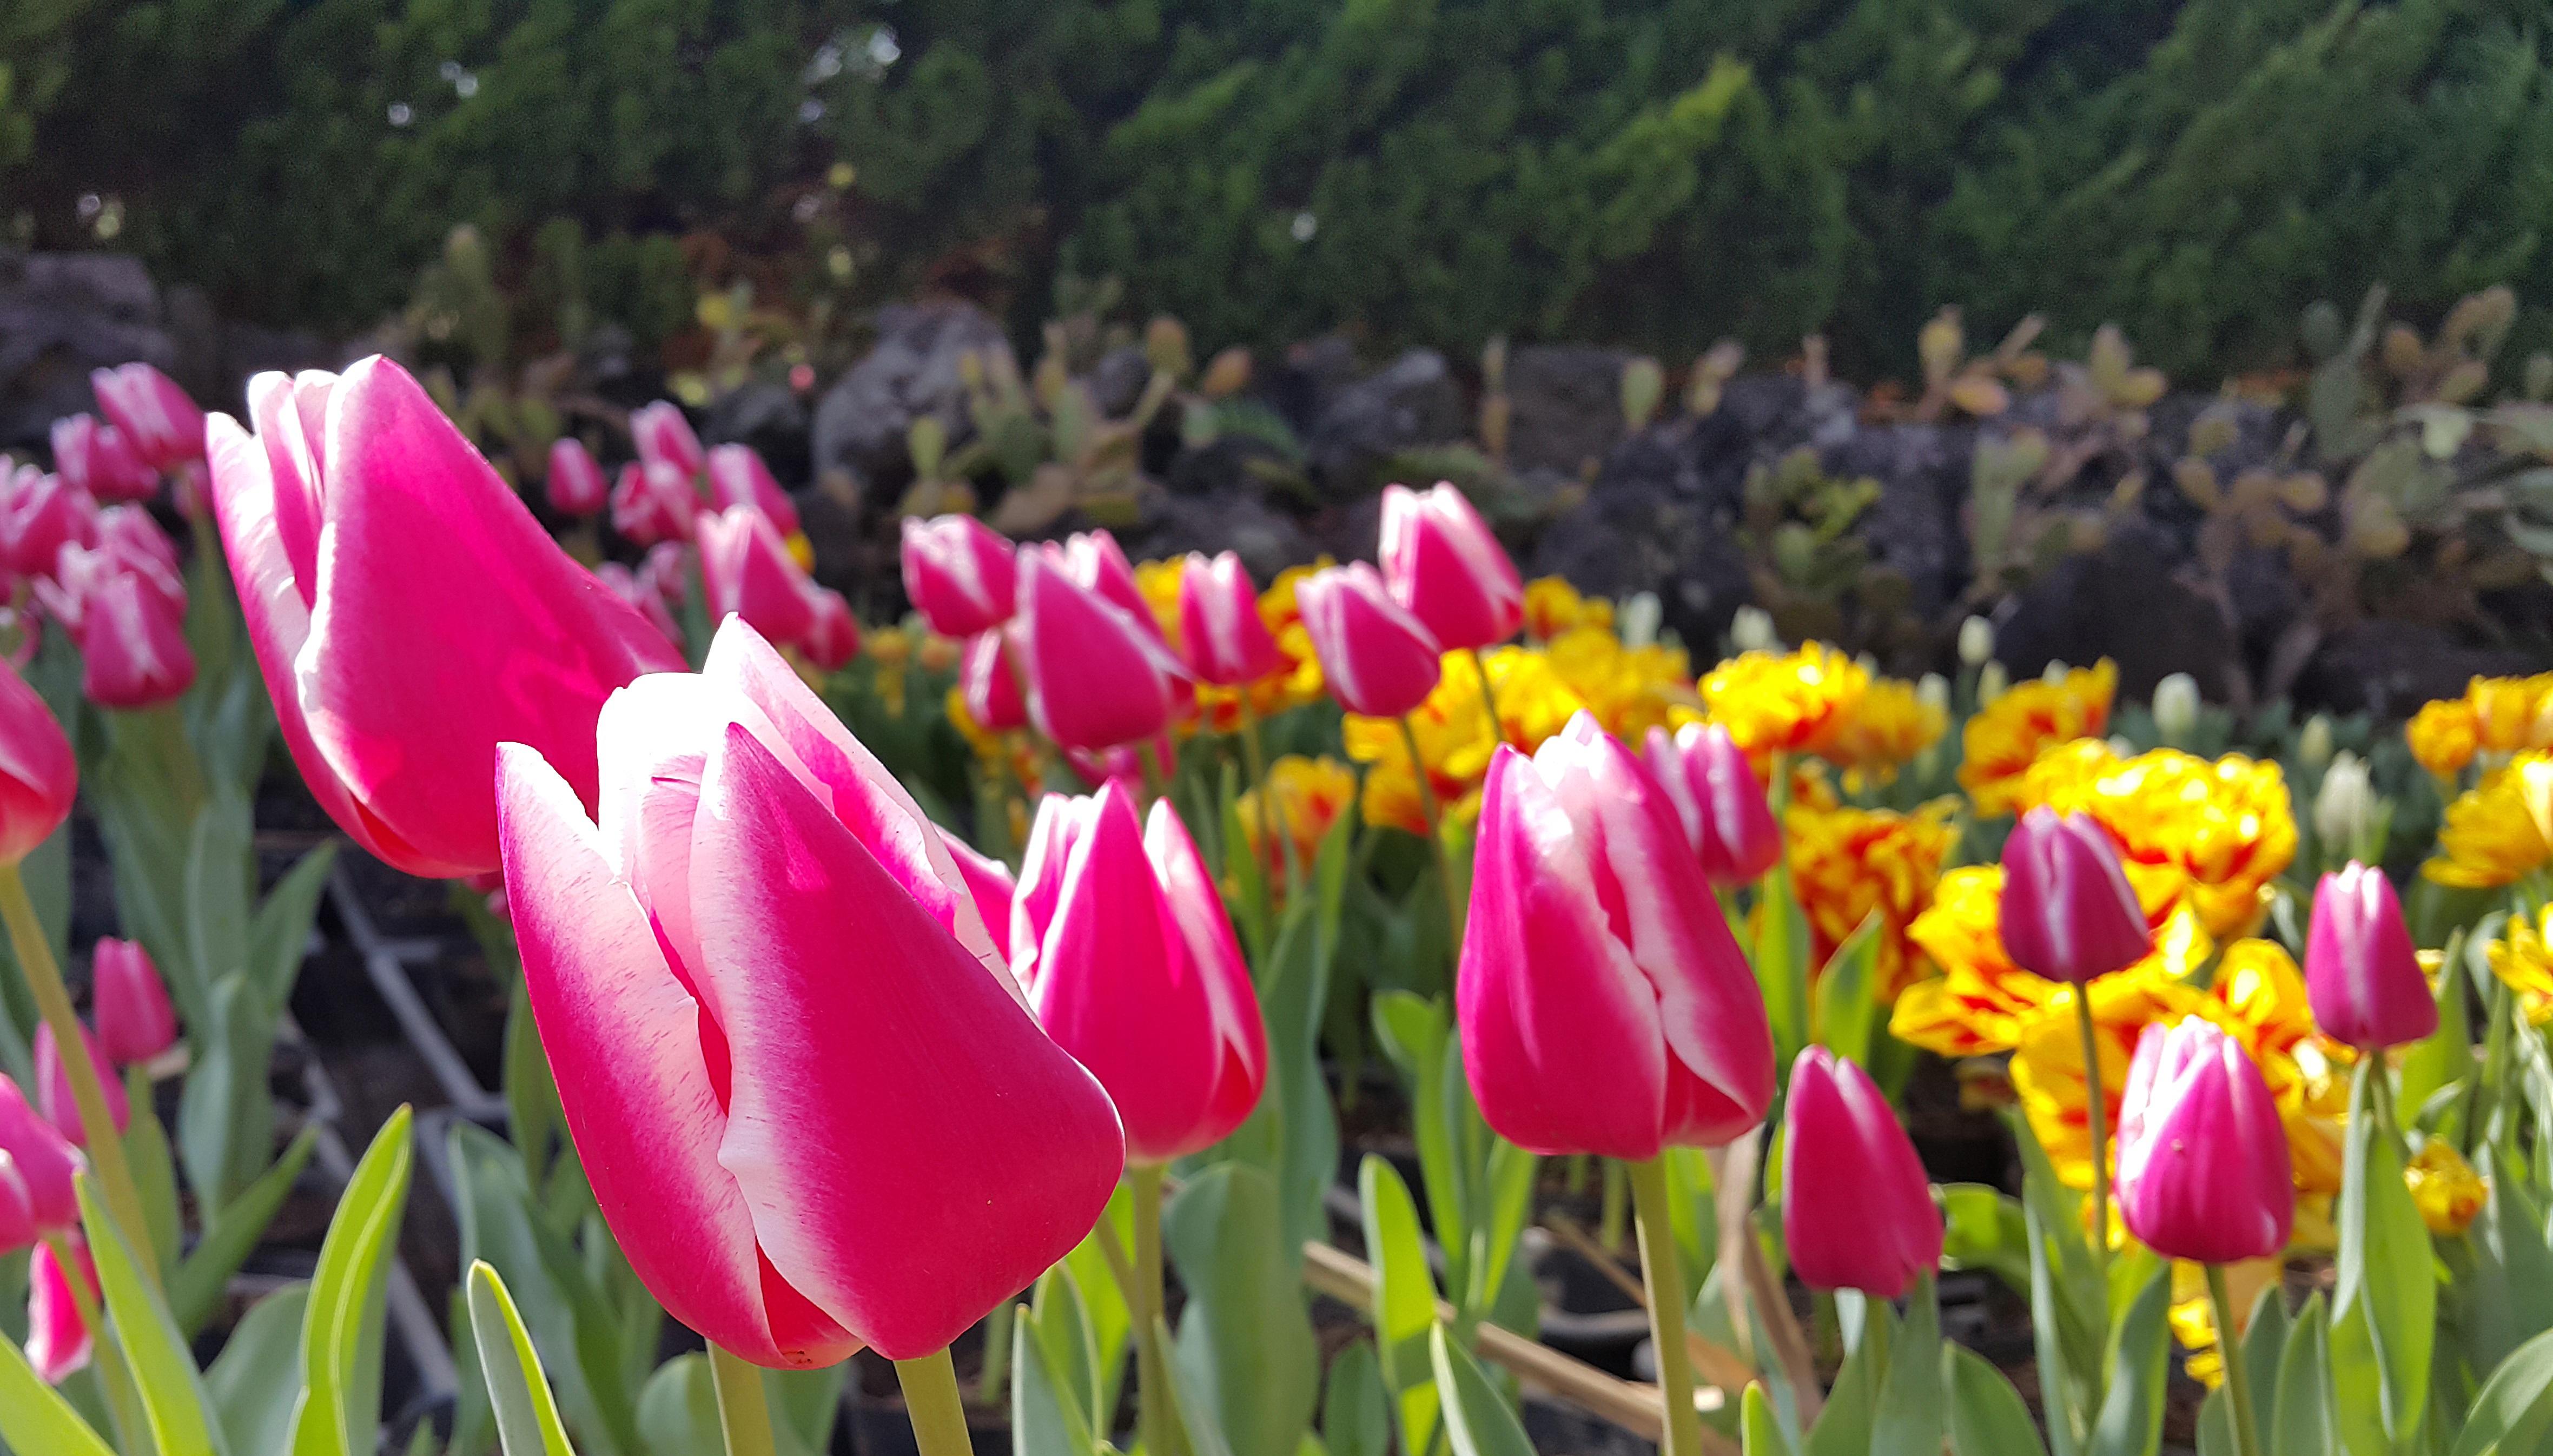 Free Images Nature Petal Tulip Spring Botany Pink Flora